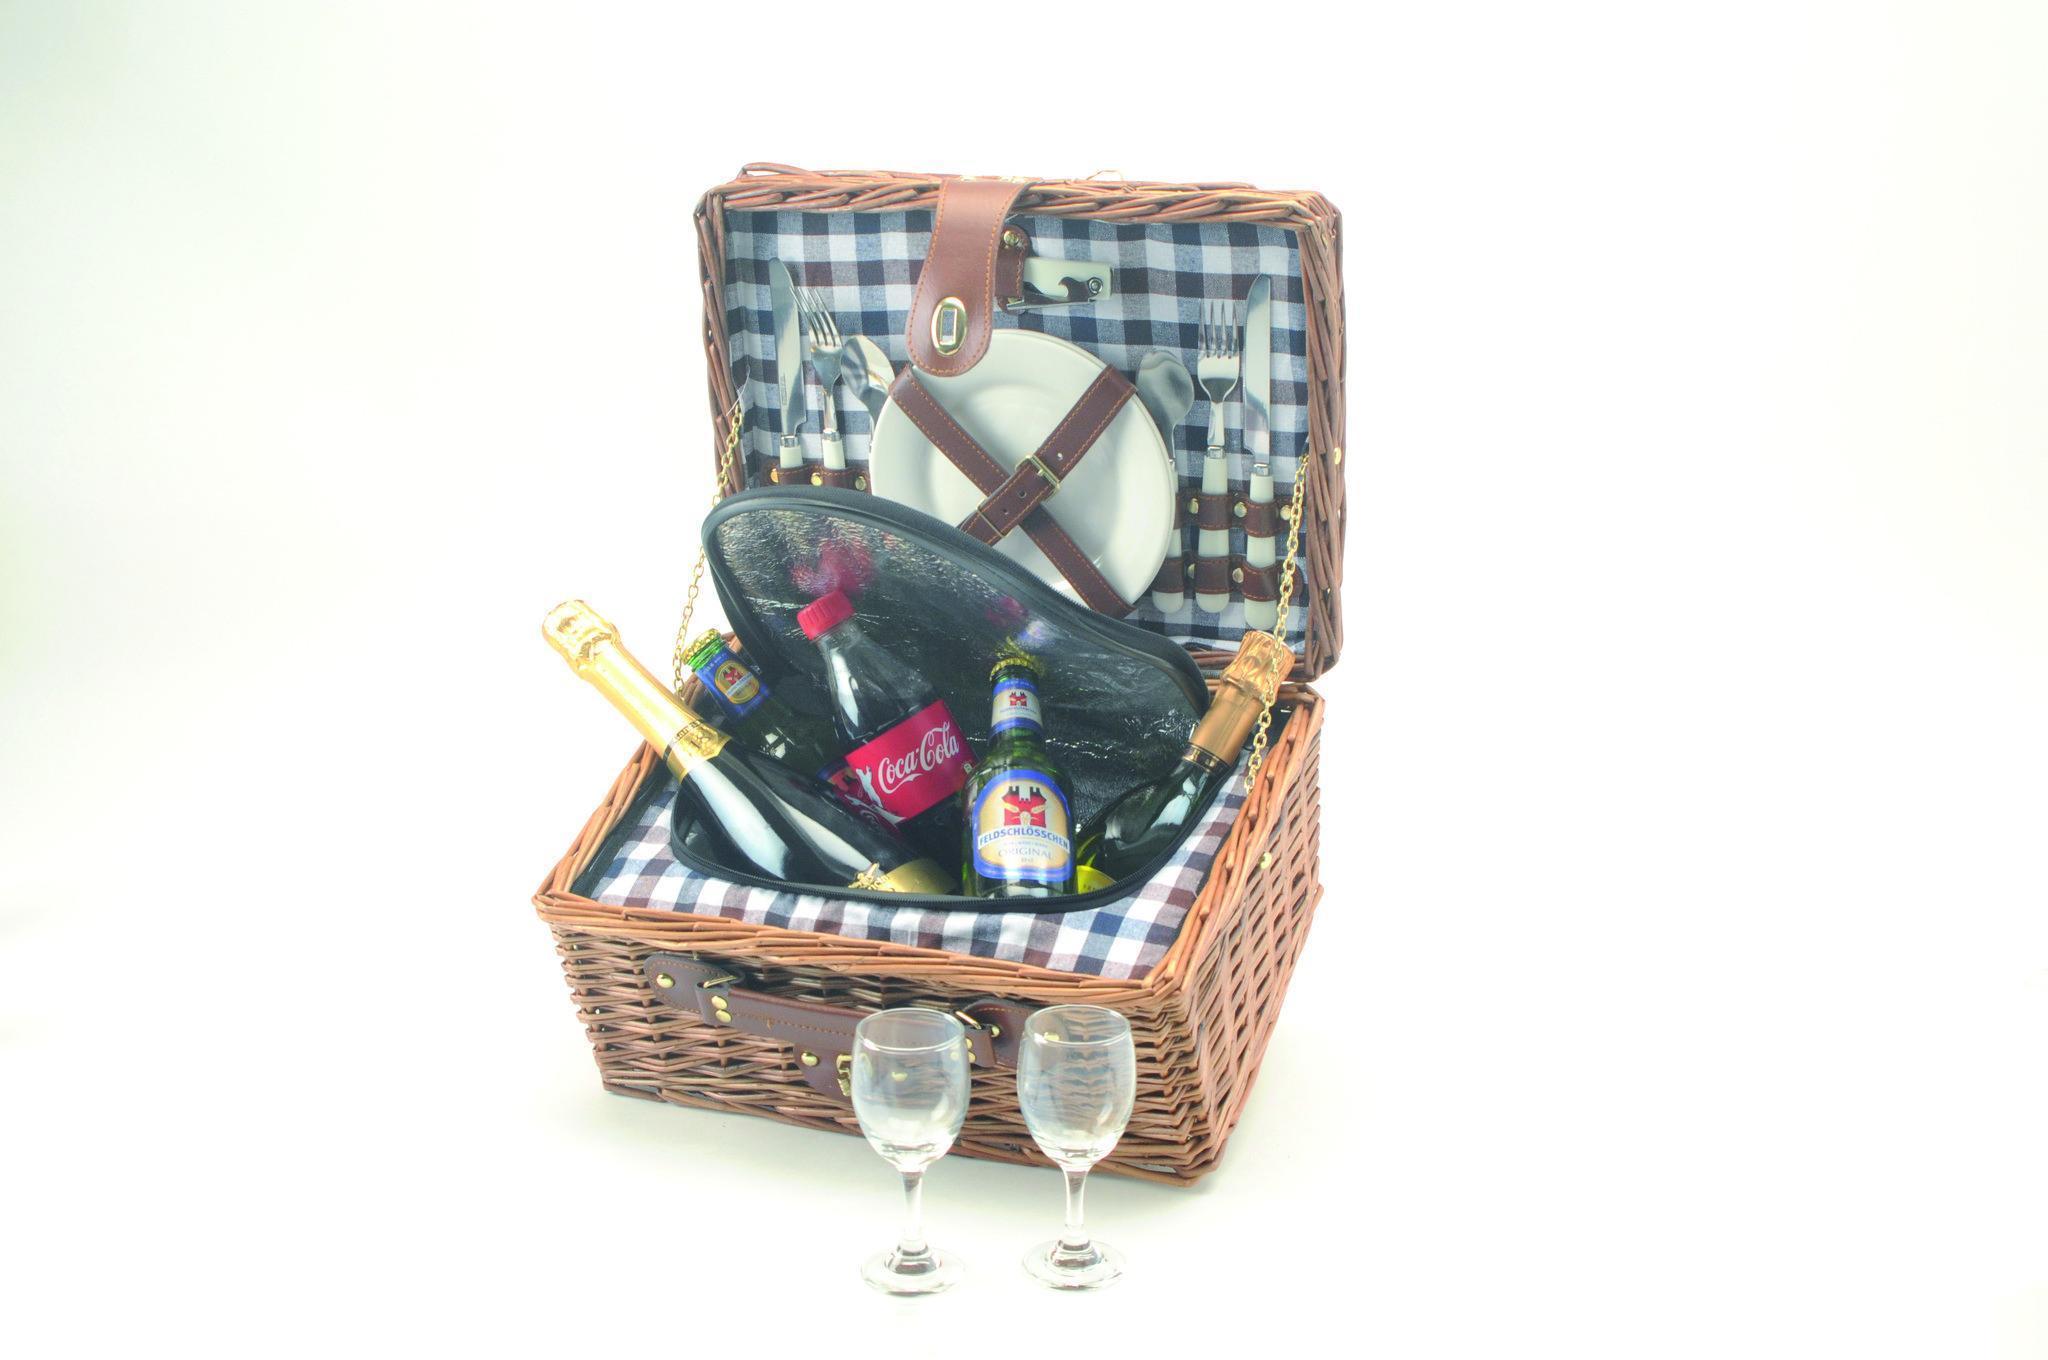 picknickkorb hyde park f r 2 personen picknick online bei isda kaufen. Black Bedroom Furniture Sets. Home Design Ideas